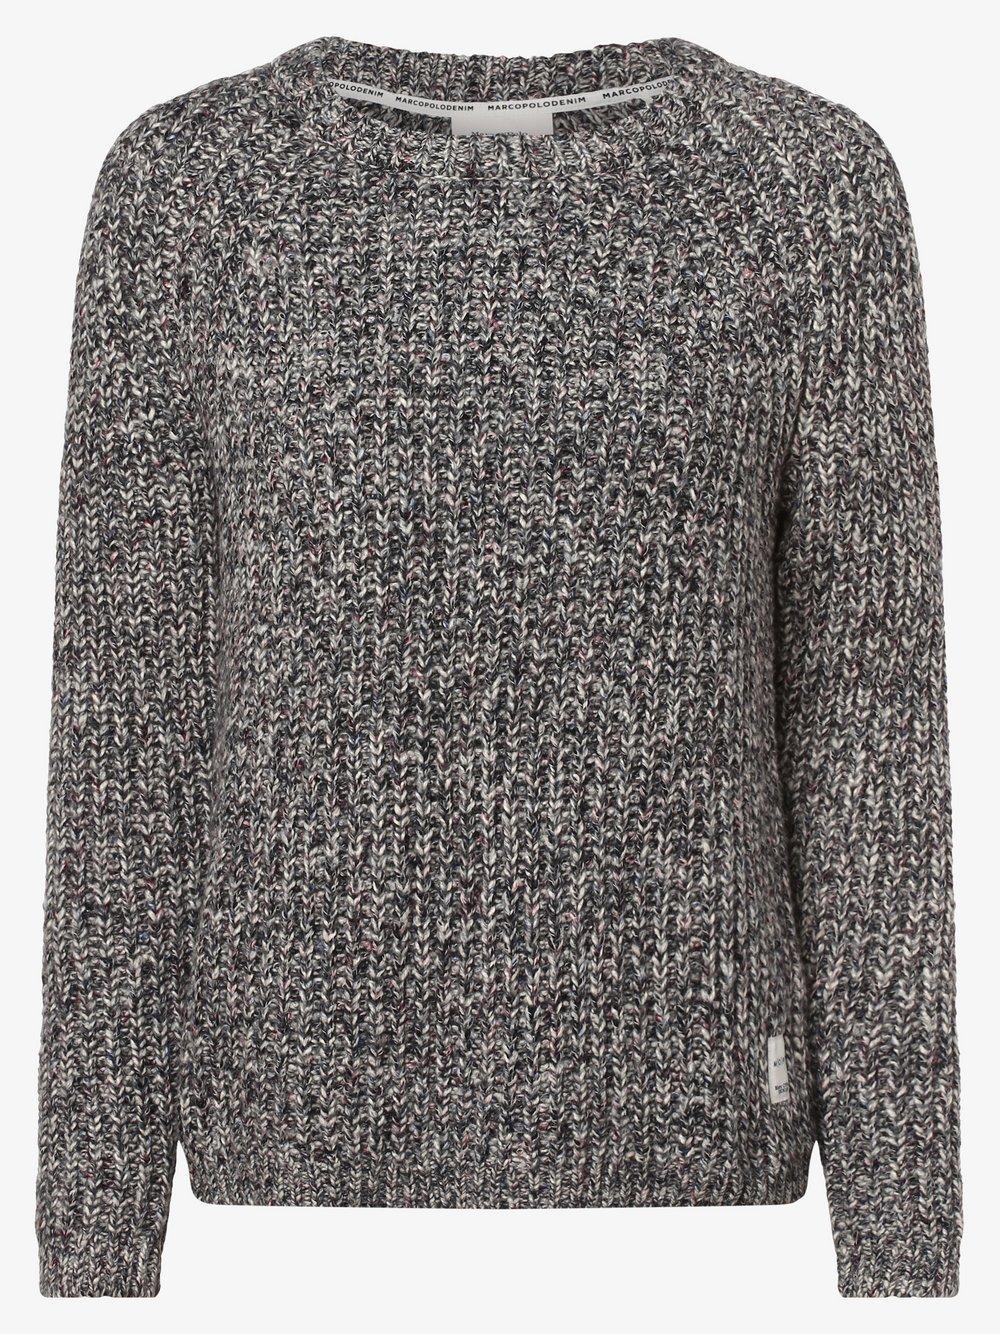 Marc O'Polo Denim – Sweter damski, wielokolorowy Van Graaf 444946-0001